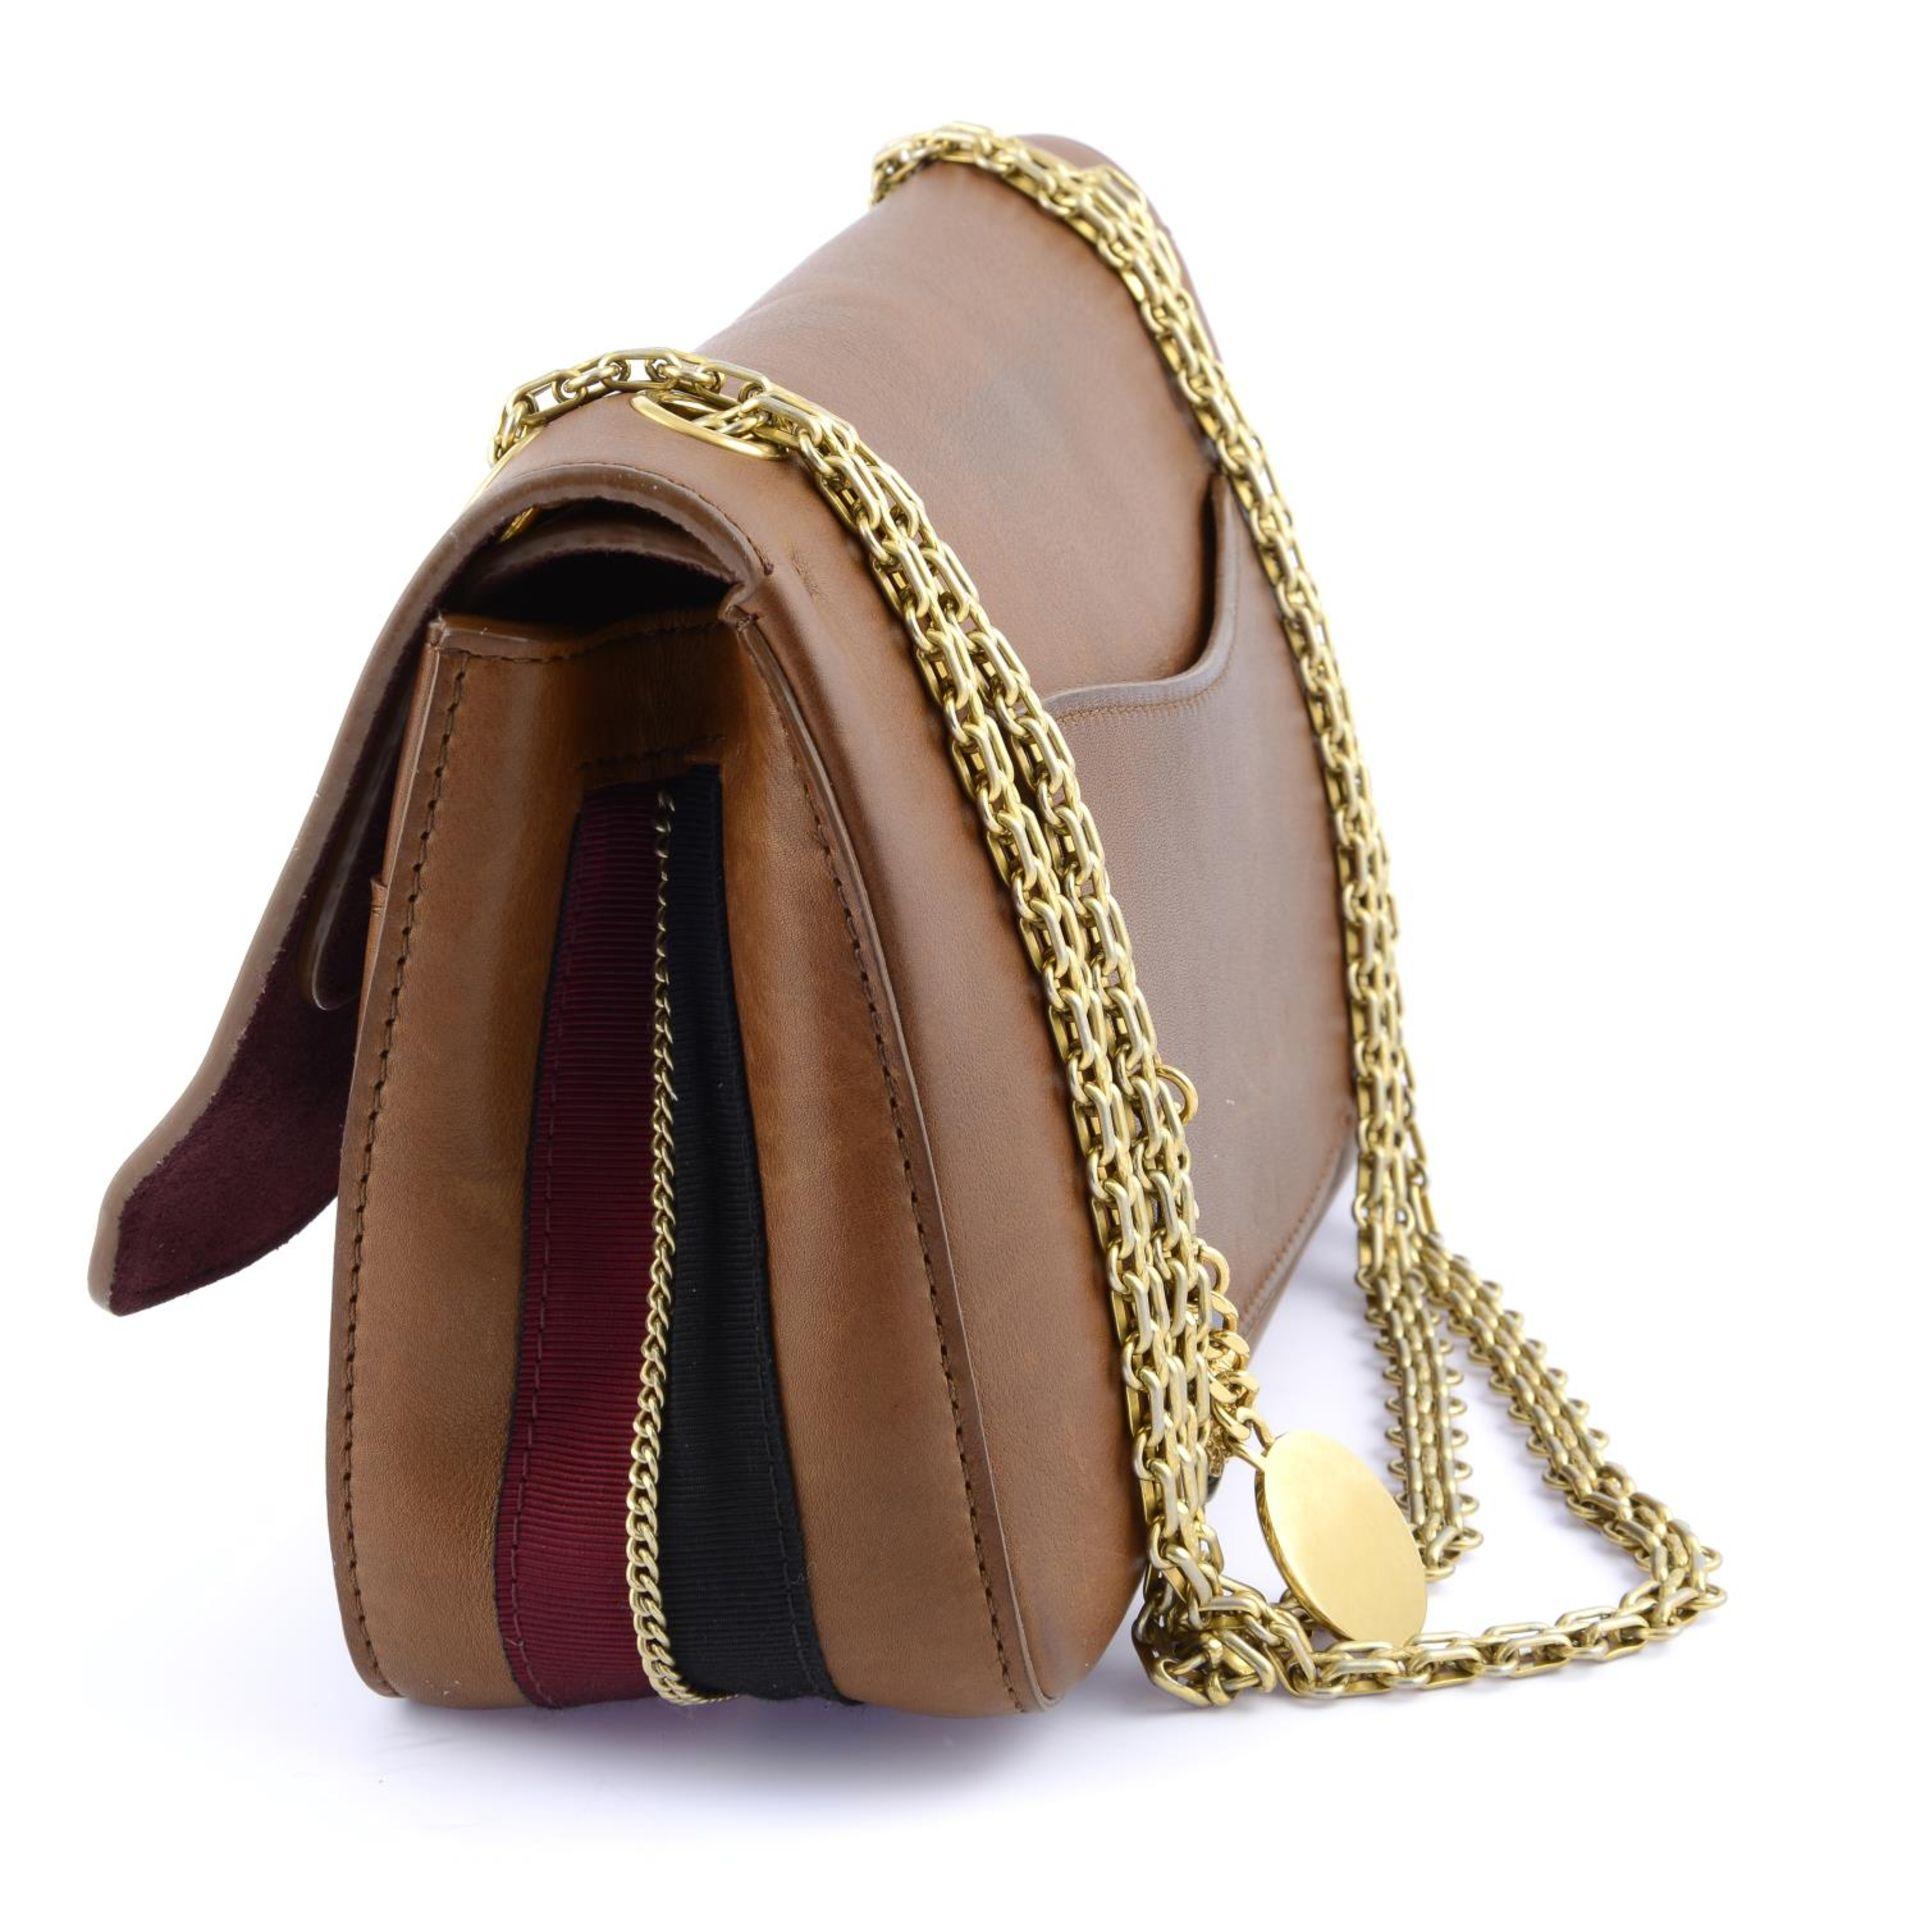 CHANEL - a special edition tan 2.55 Nude Medallion Reissue 226 handbag. - Image 3 of 5